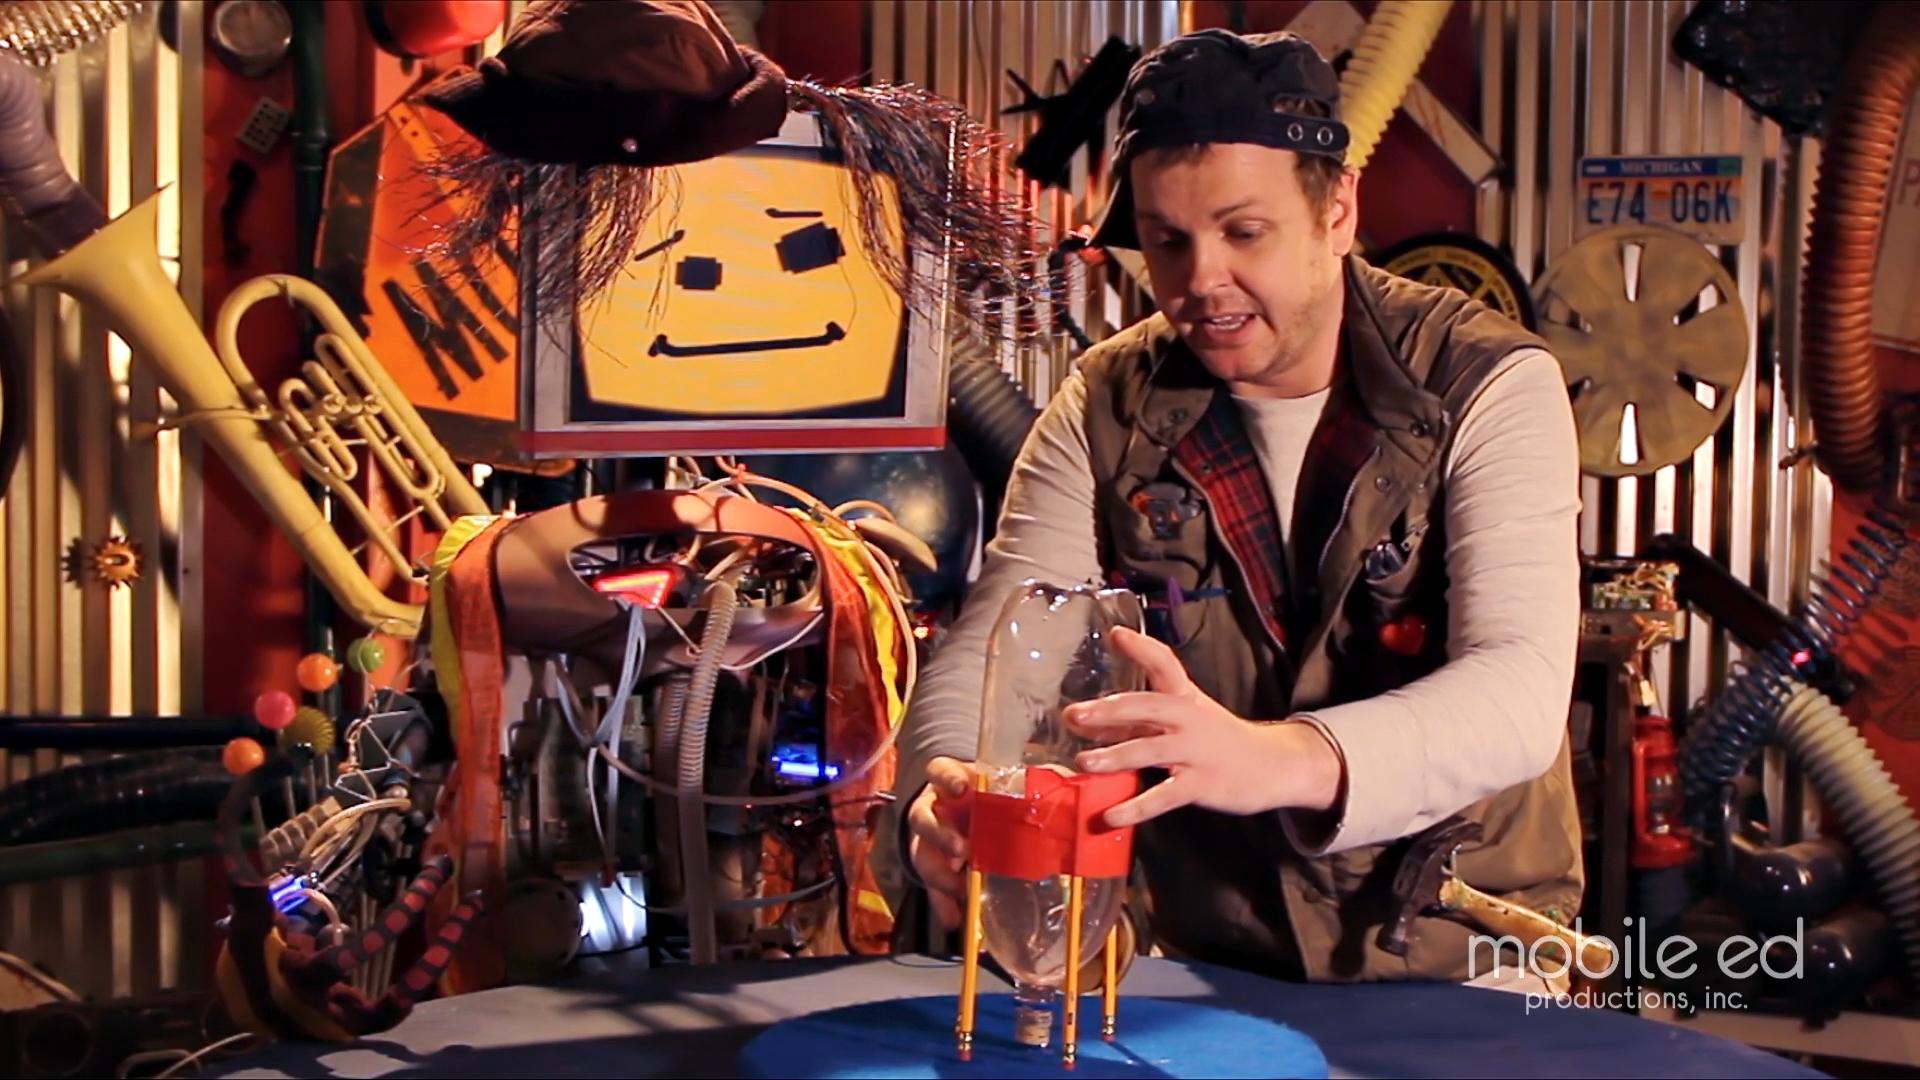 Build your own rocket - turn the rocket upside down  |  Handy Dan the Junkyard Man